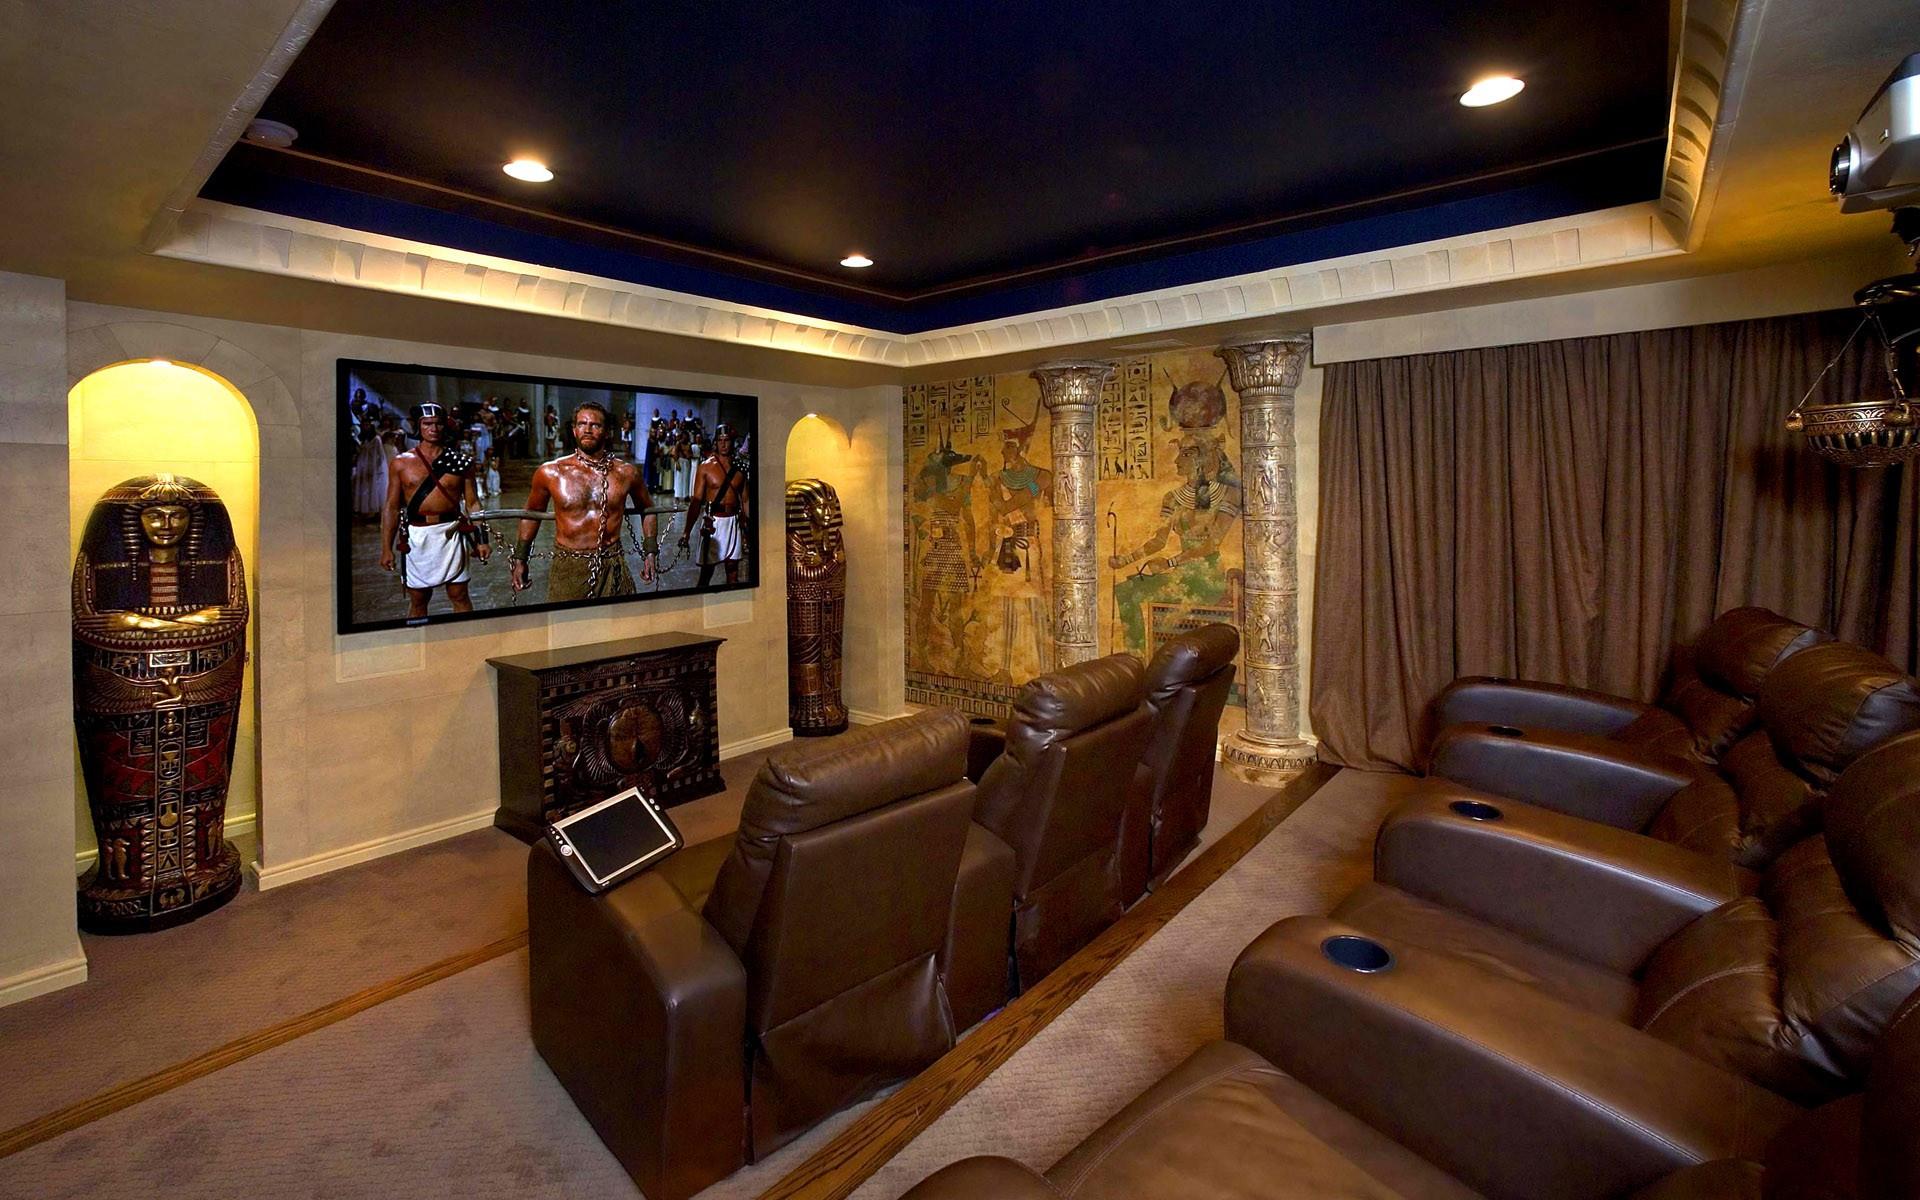 Home cinema wallpaper 8489 1920x1200